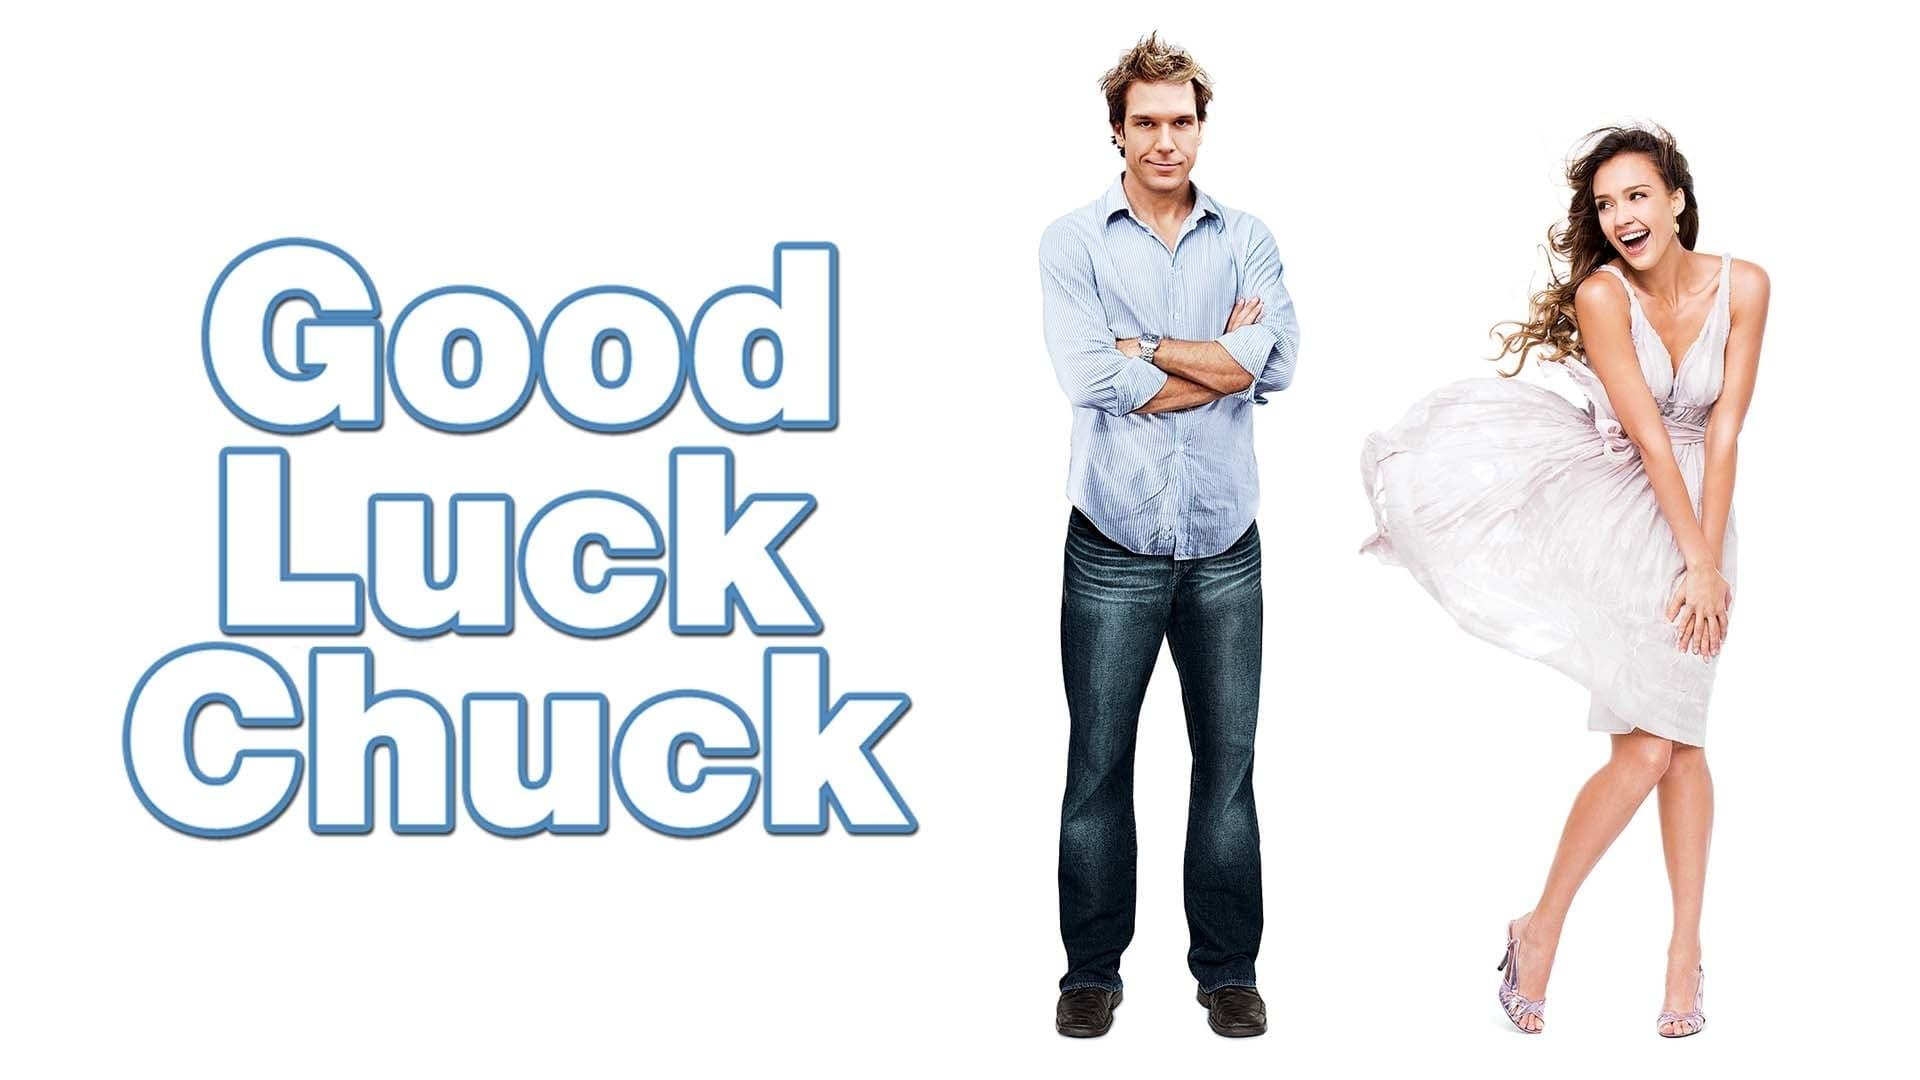 watch good luck chuck online free tubeplus